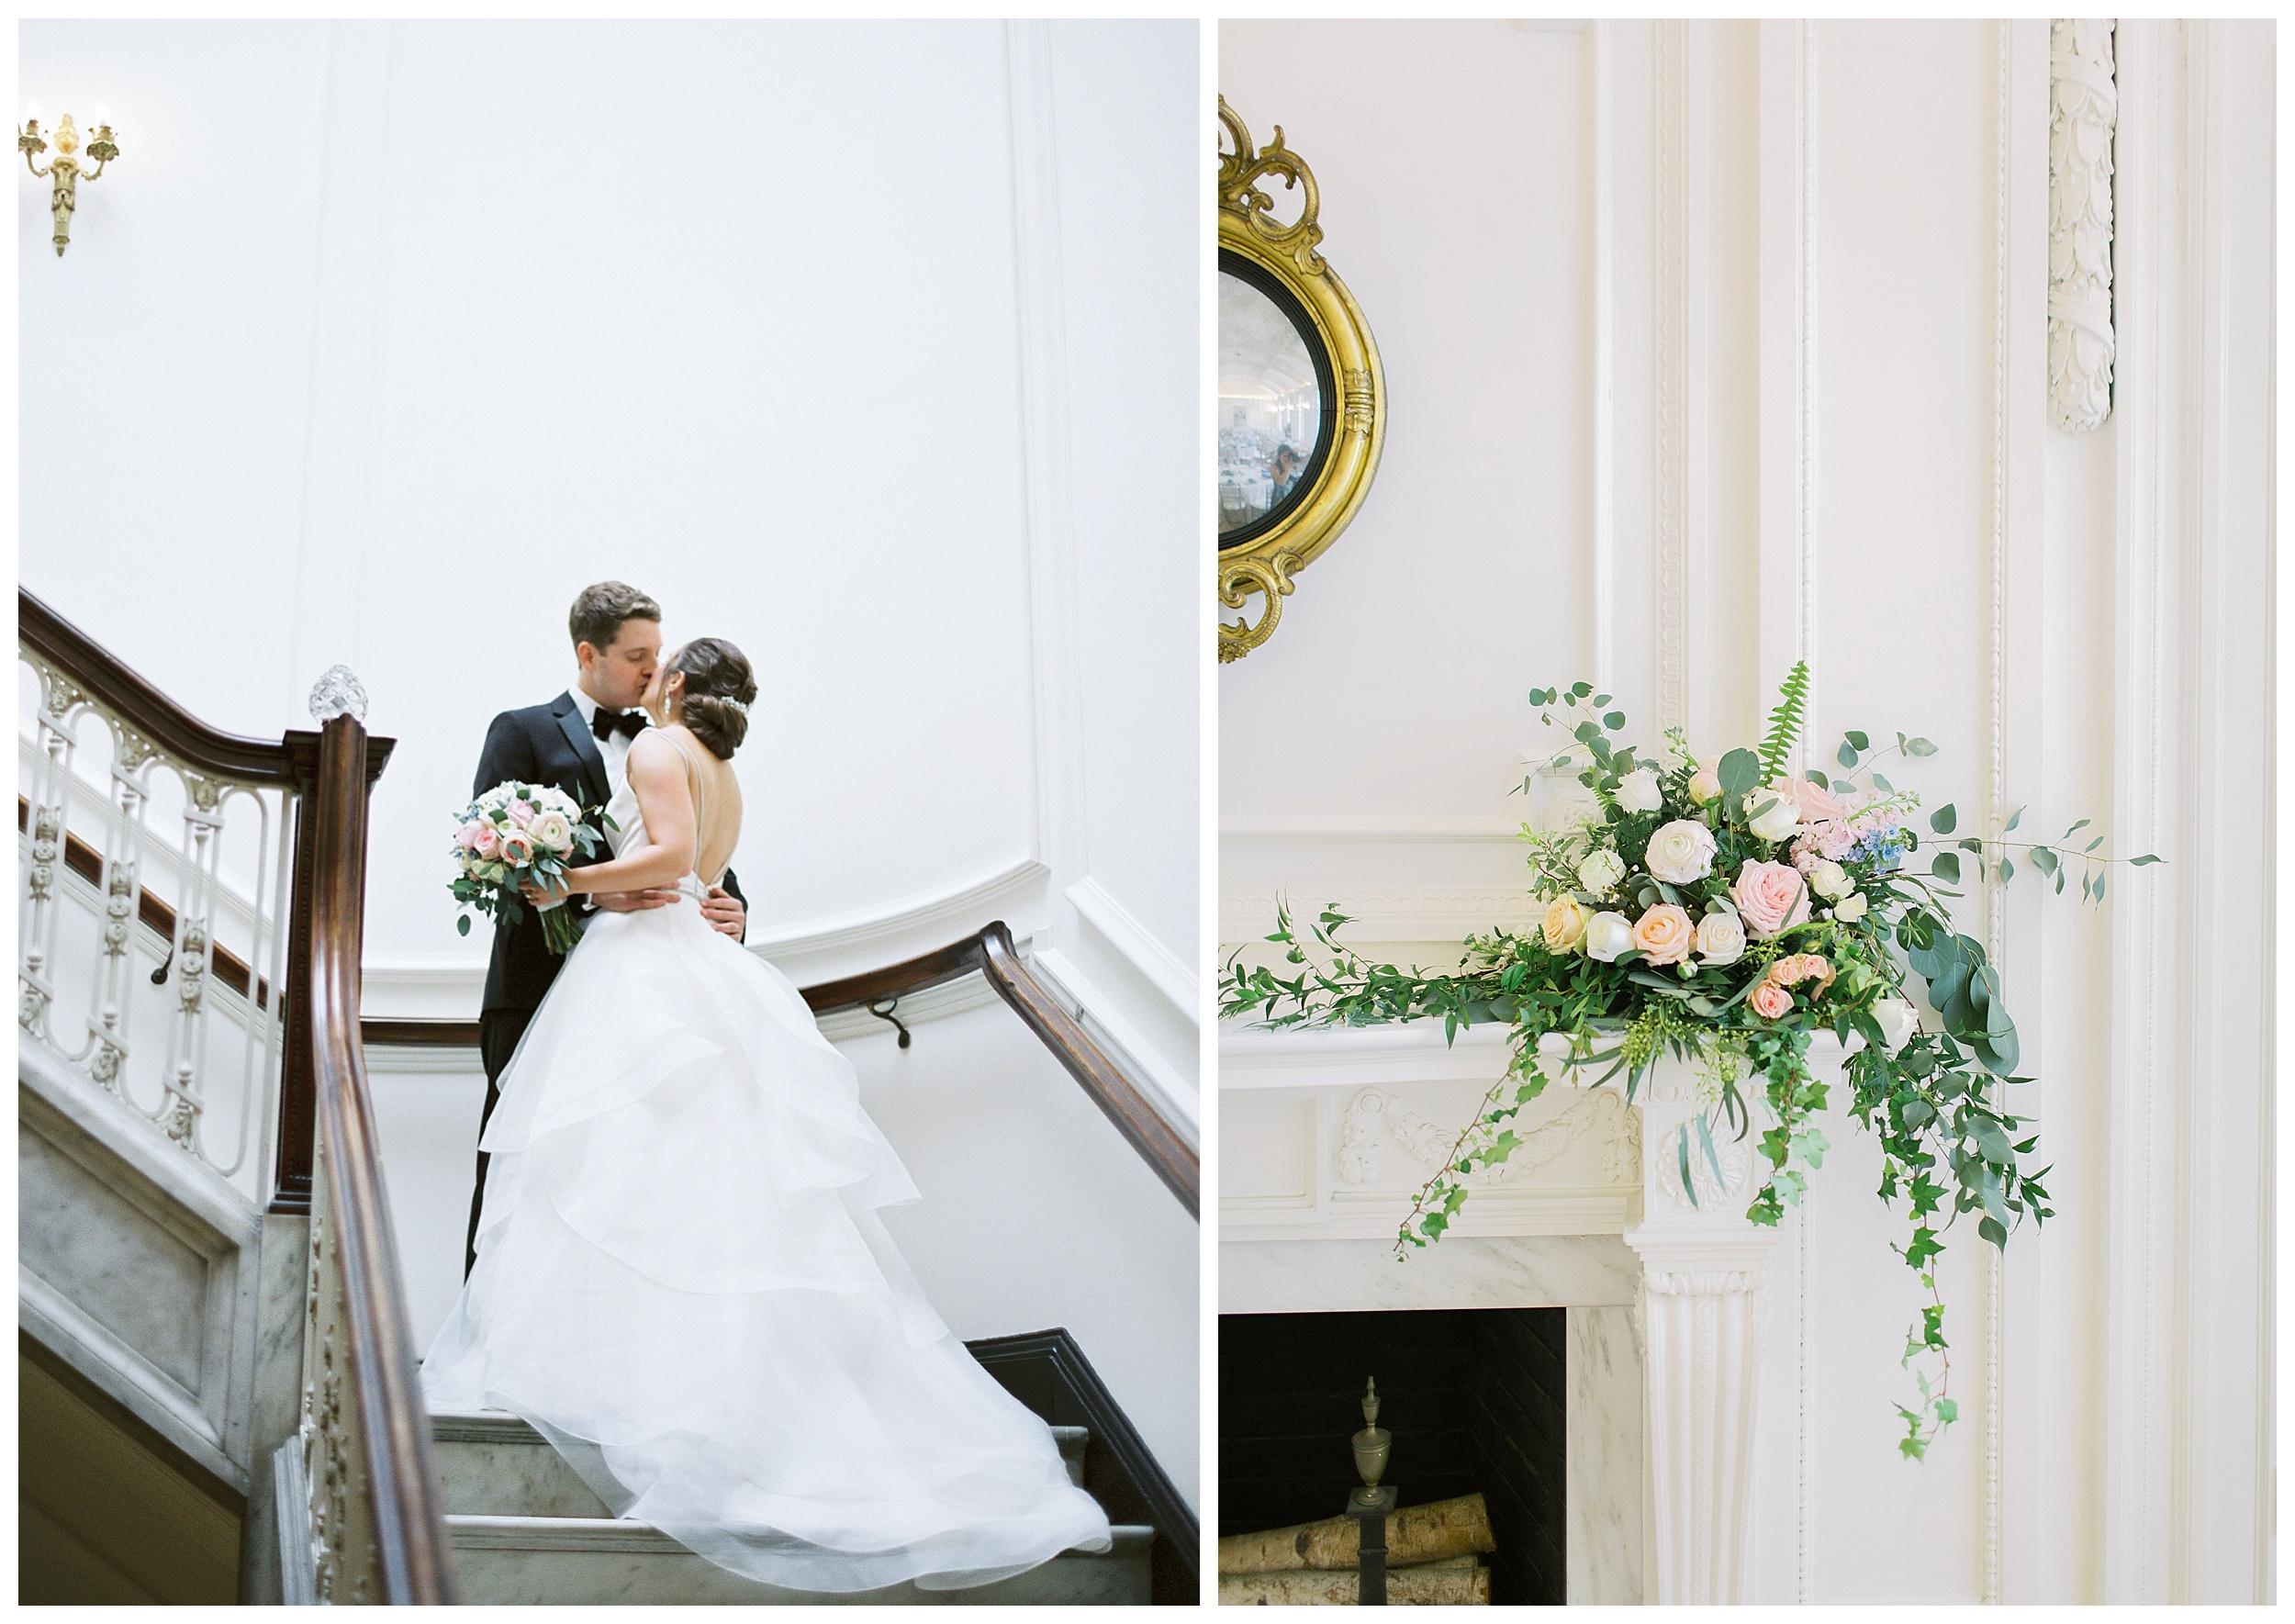 DAR Constitution Hall Wedding Wedding | Daughters of the American Revolution Wedding | District of Columbia Film Wedding Photographer Kir Tuben_0123.jpg